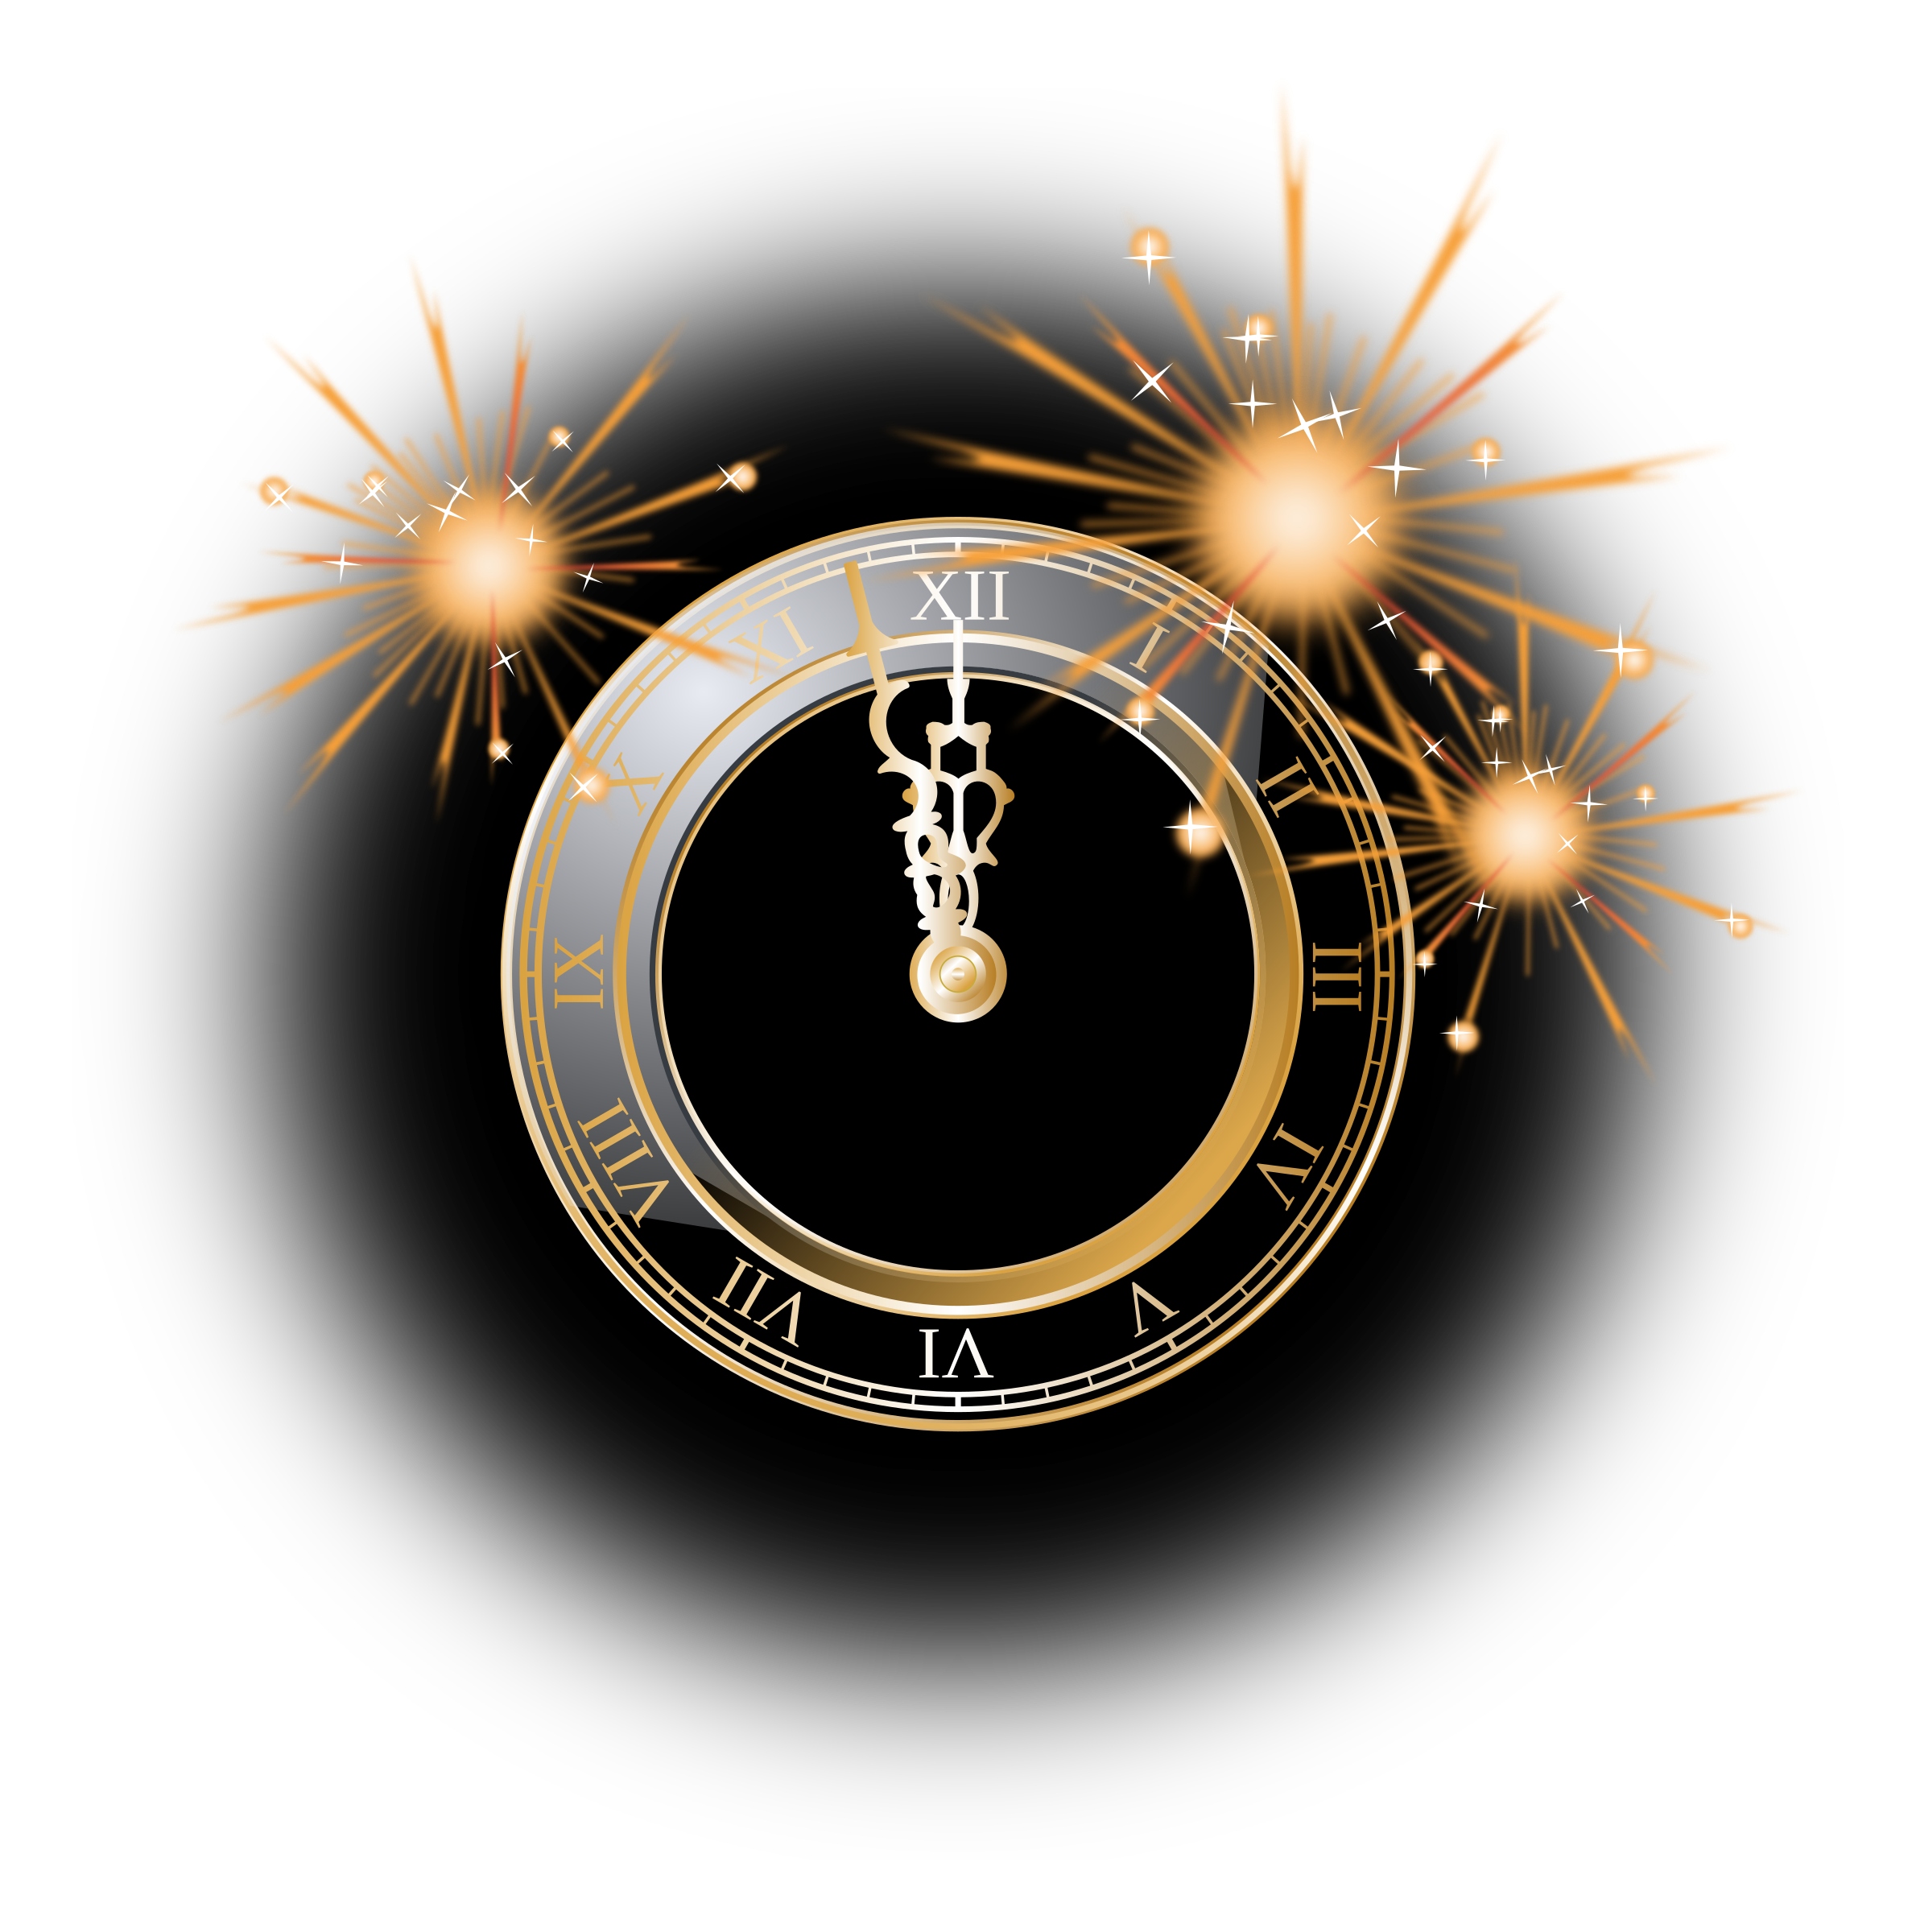 Clock big image png. Clocks clipart new year